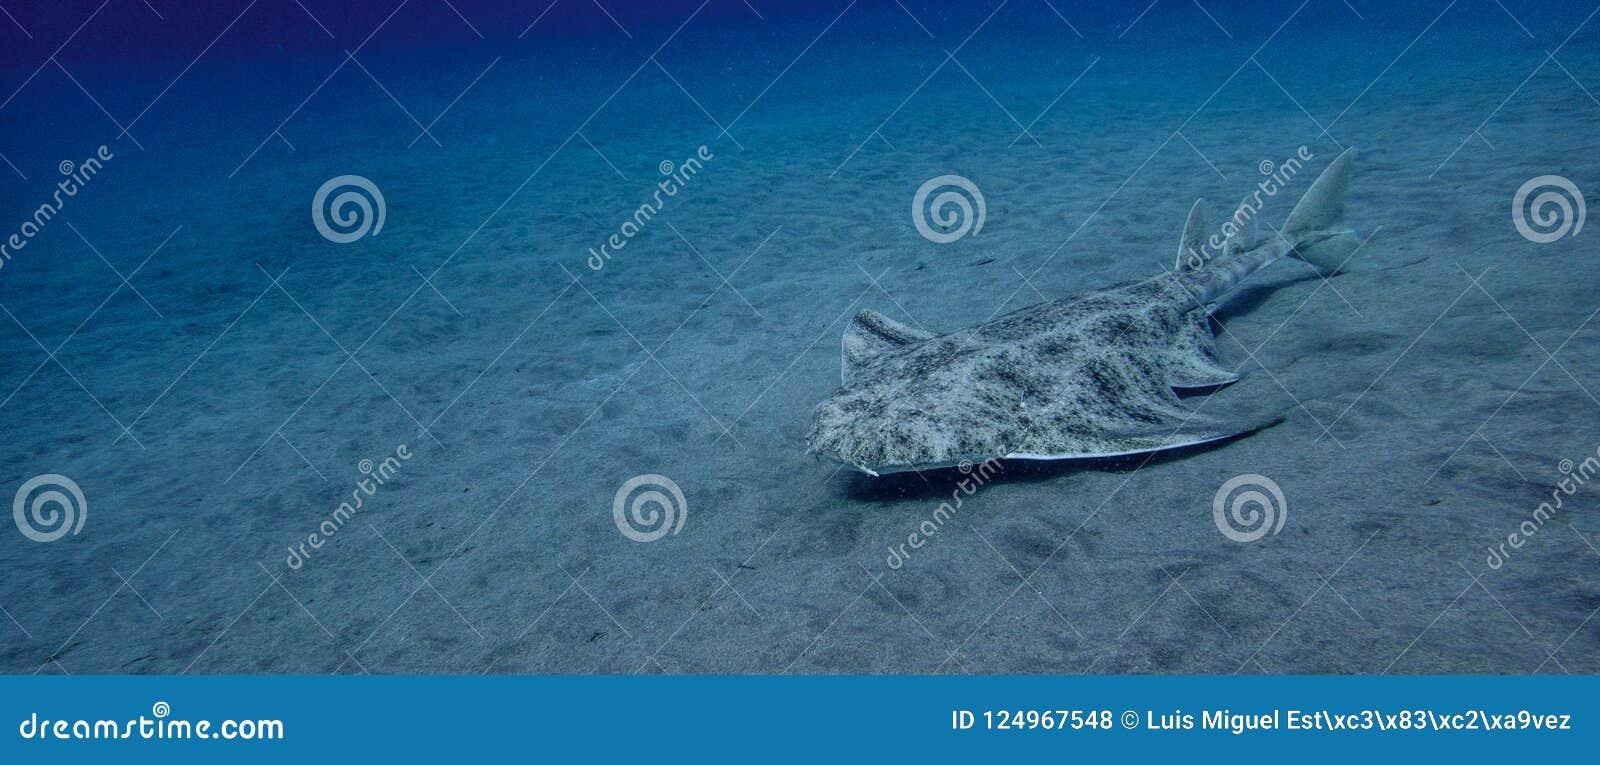 Angelshark över sand i det blåa havet